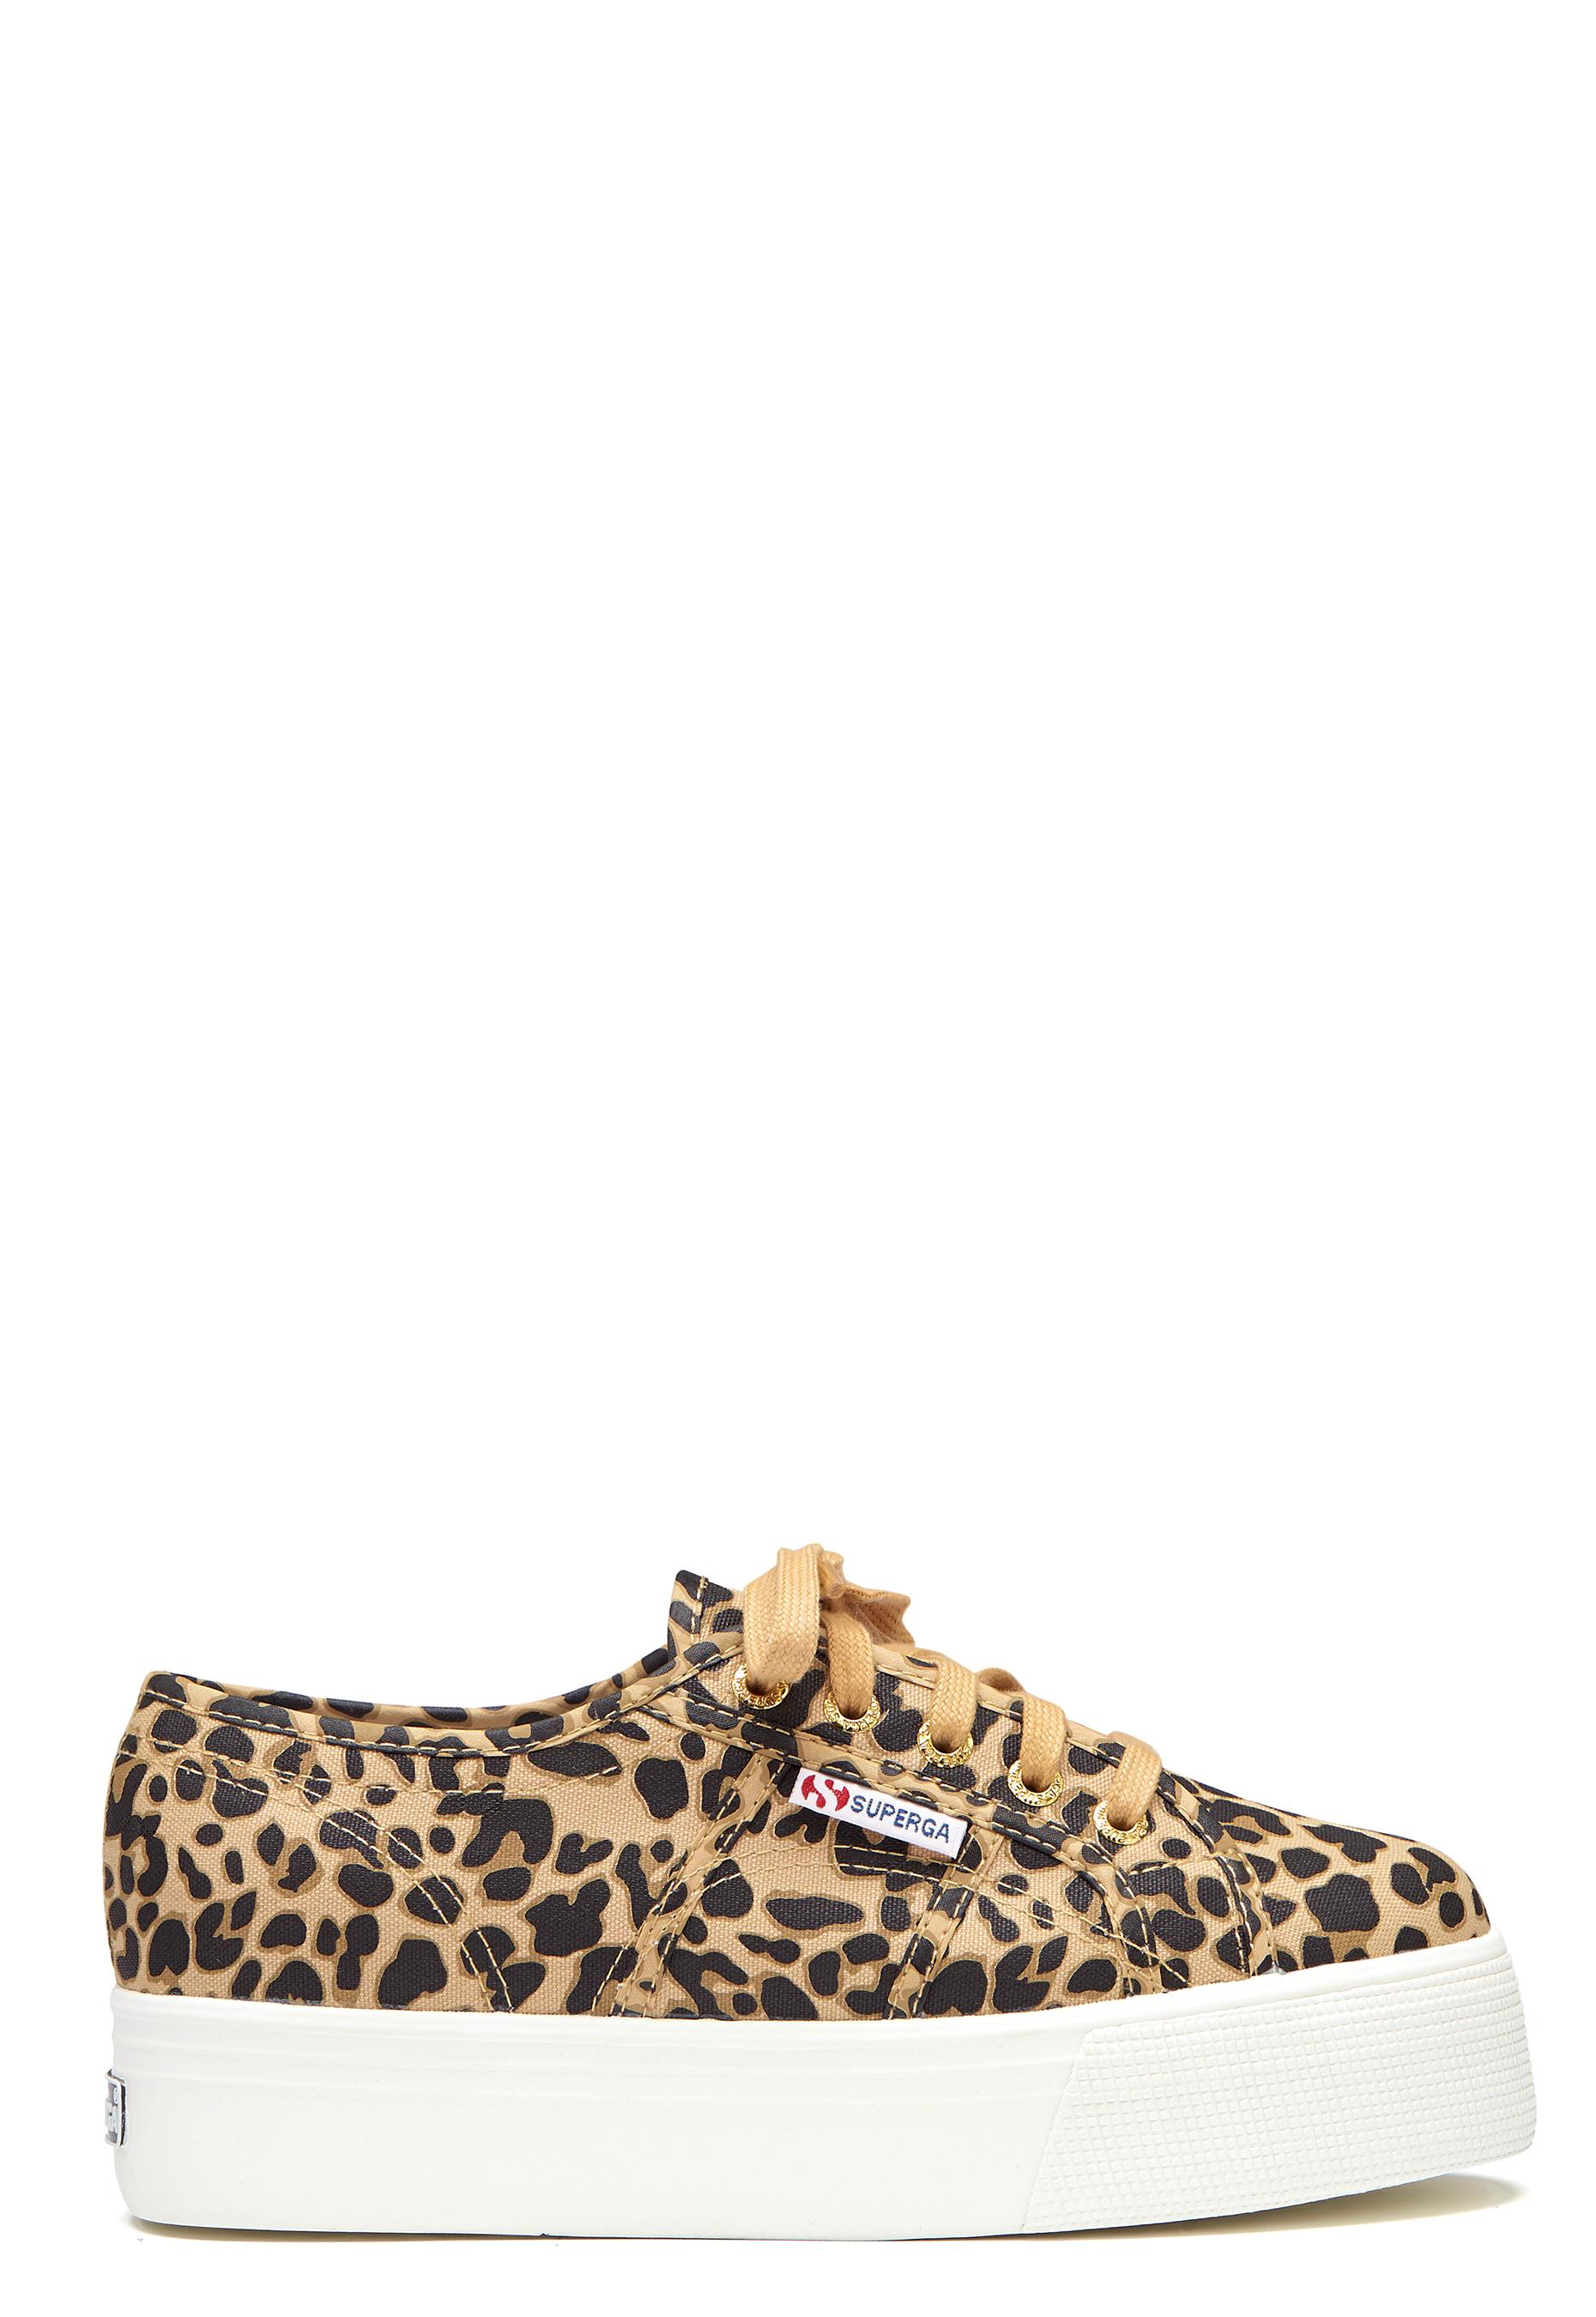 Classic Sneakers Leopard - Bubbleroom